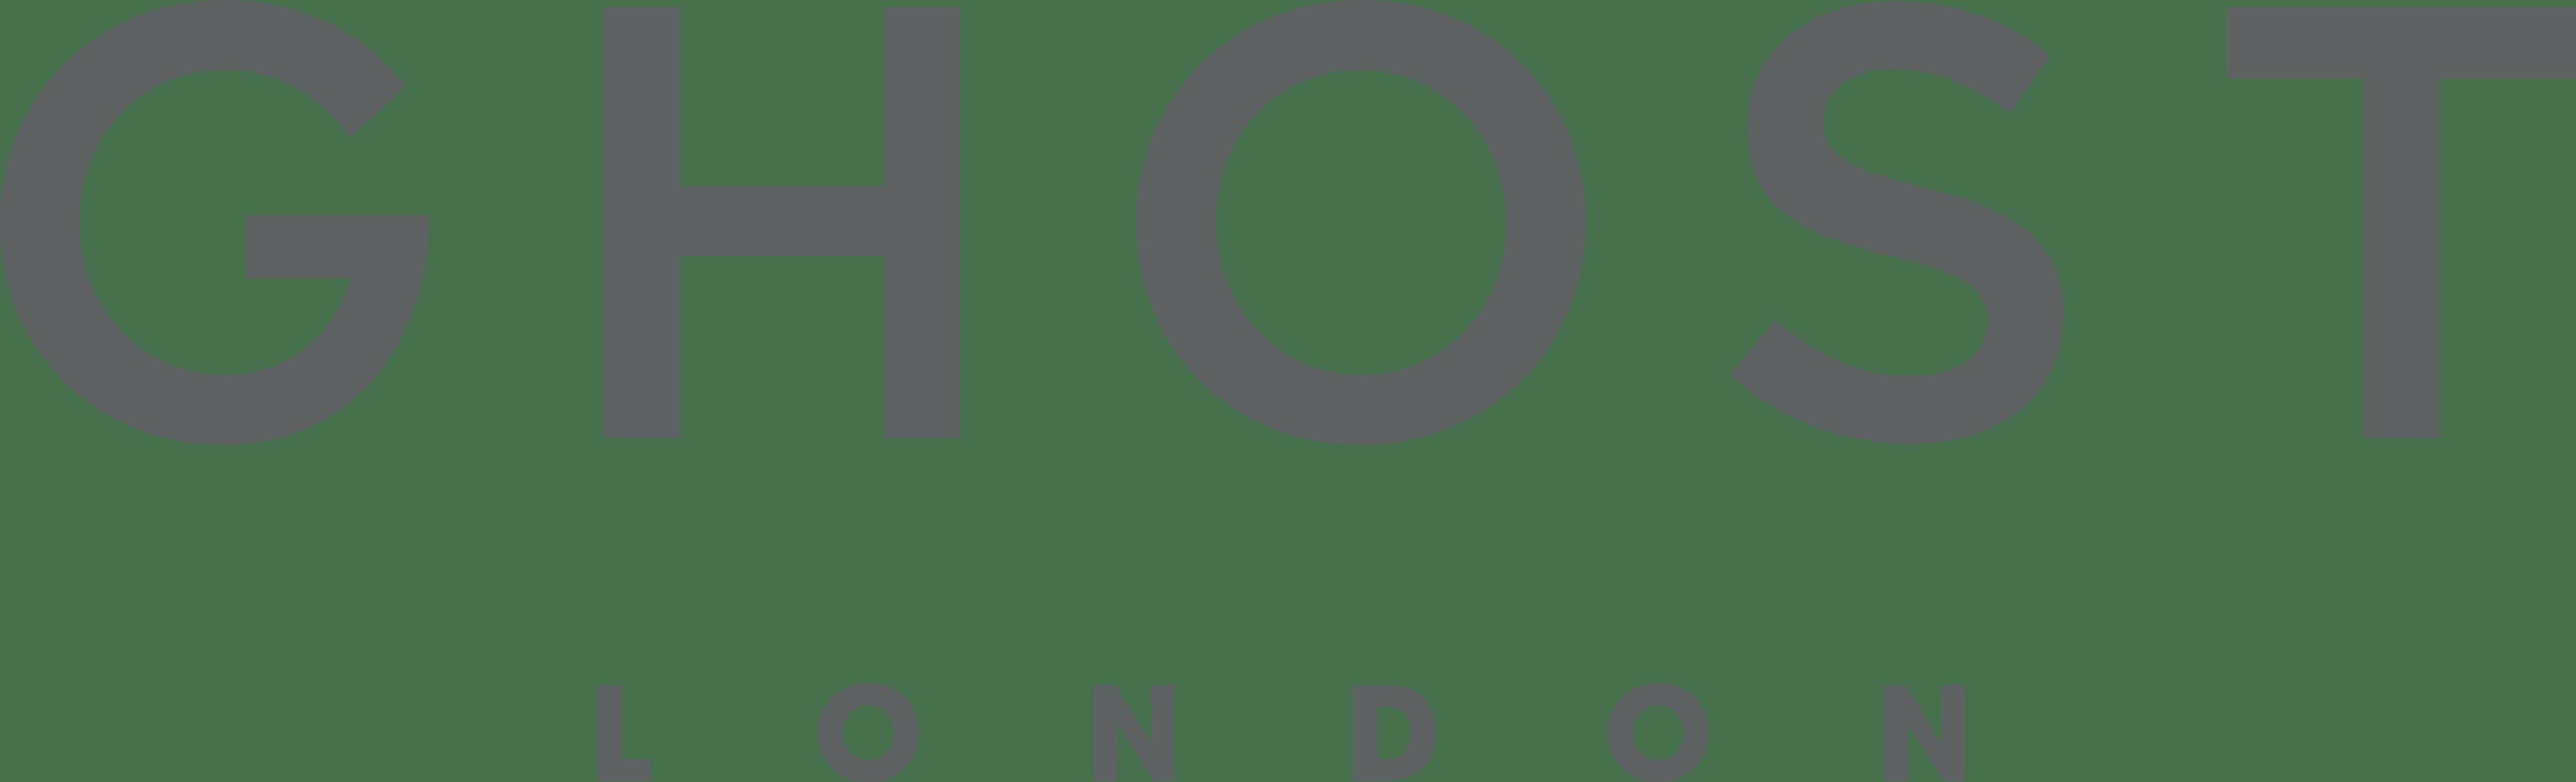 GHOST London logo